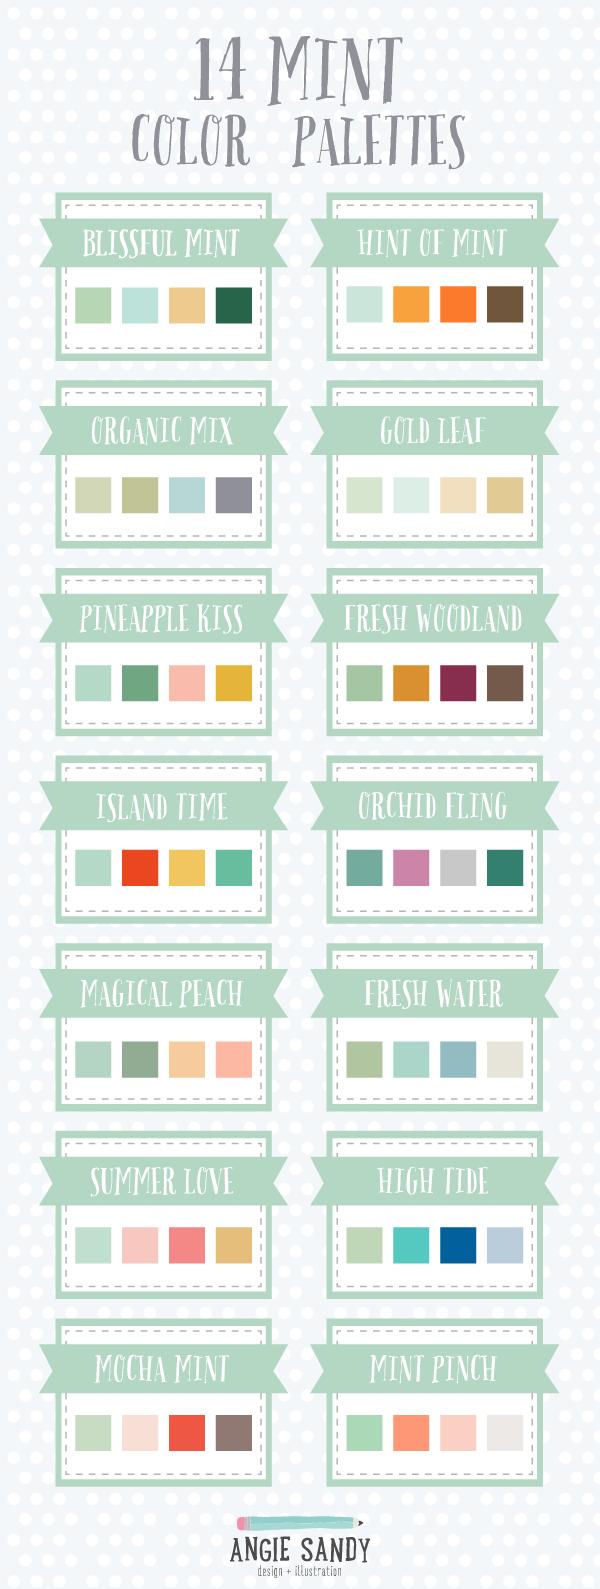 14 mint color palettes color pinterest mint farbe kombis und mint. Black Bedroom Furniture Sets. Home Design Ideas